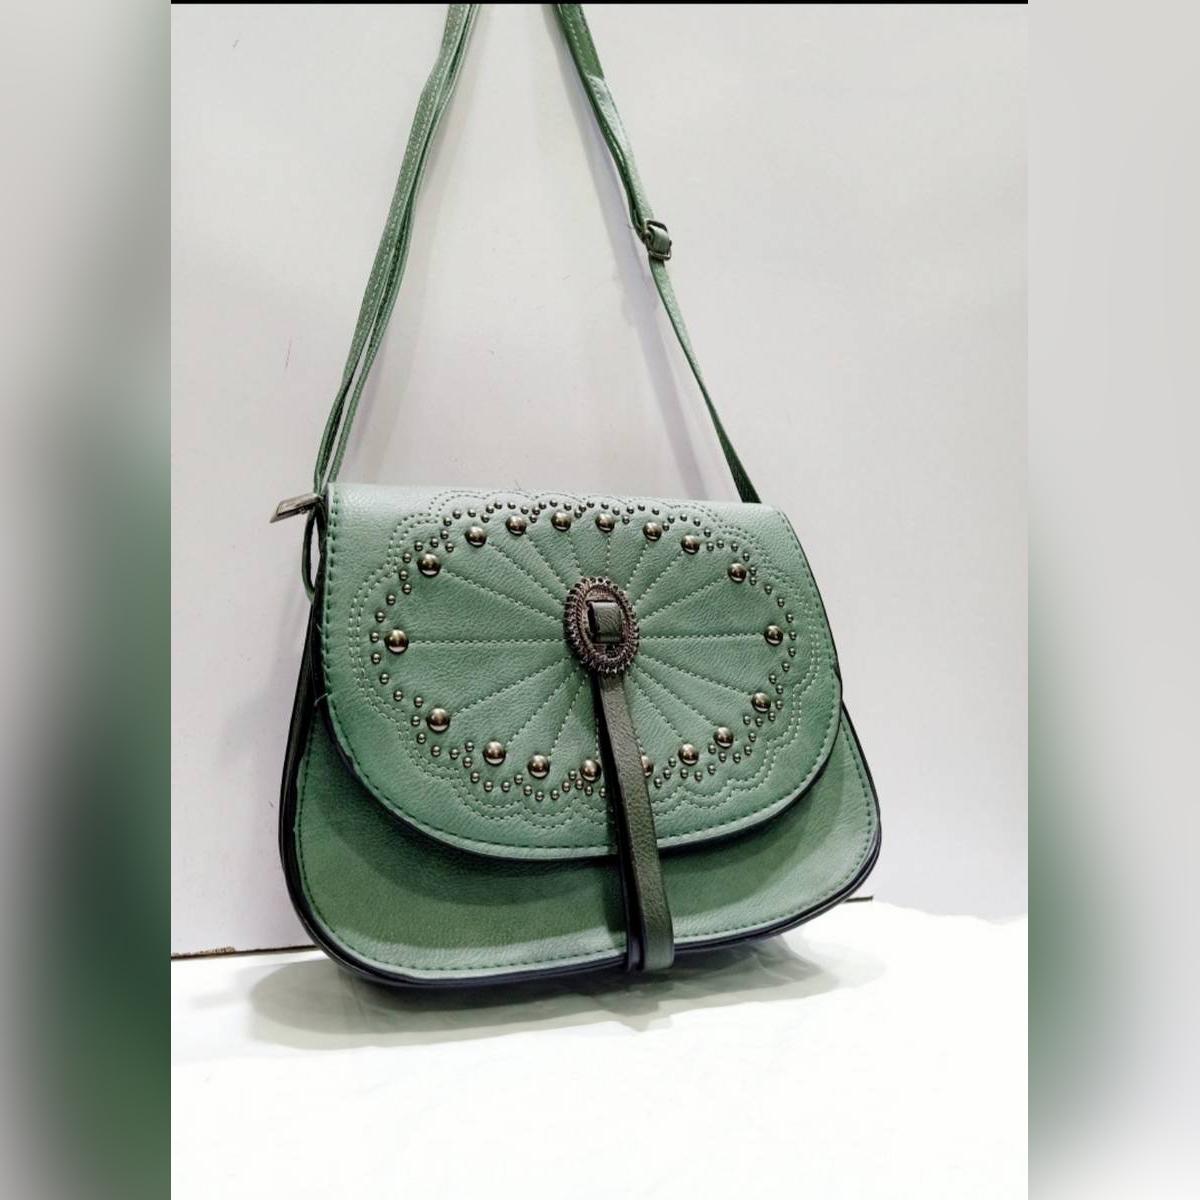 High Quality Pu Leather Stylish Frame Lock Shoulder Carry Bag, Backside Zip pocket,2 Styles Used Bag( Hand clutch+Shoulder Strap Carry ).